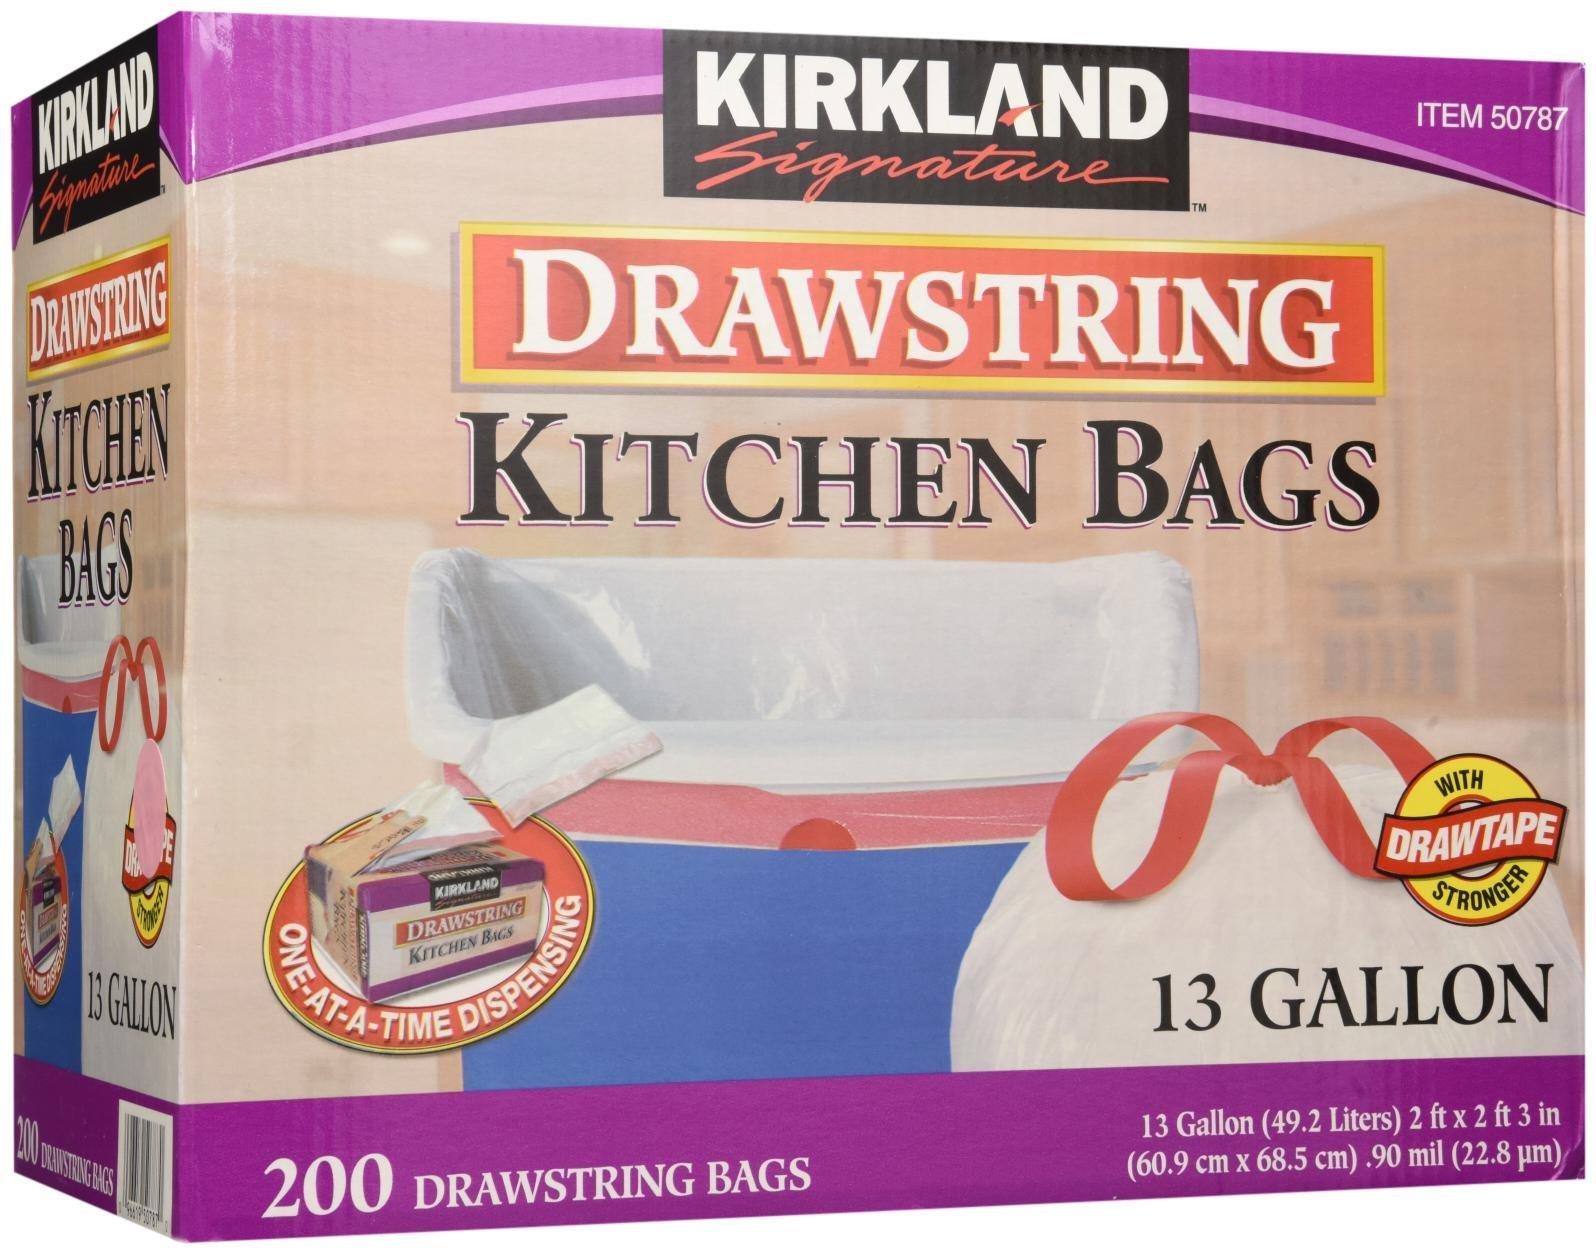 Kirkland Signature Drawstring Kitchen Trash Bags